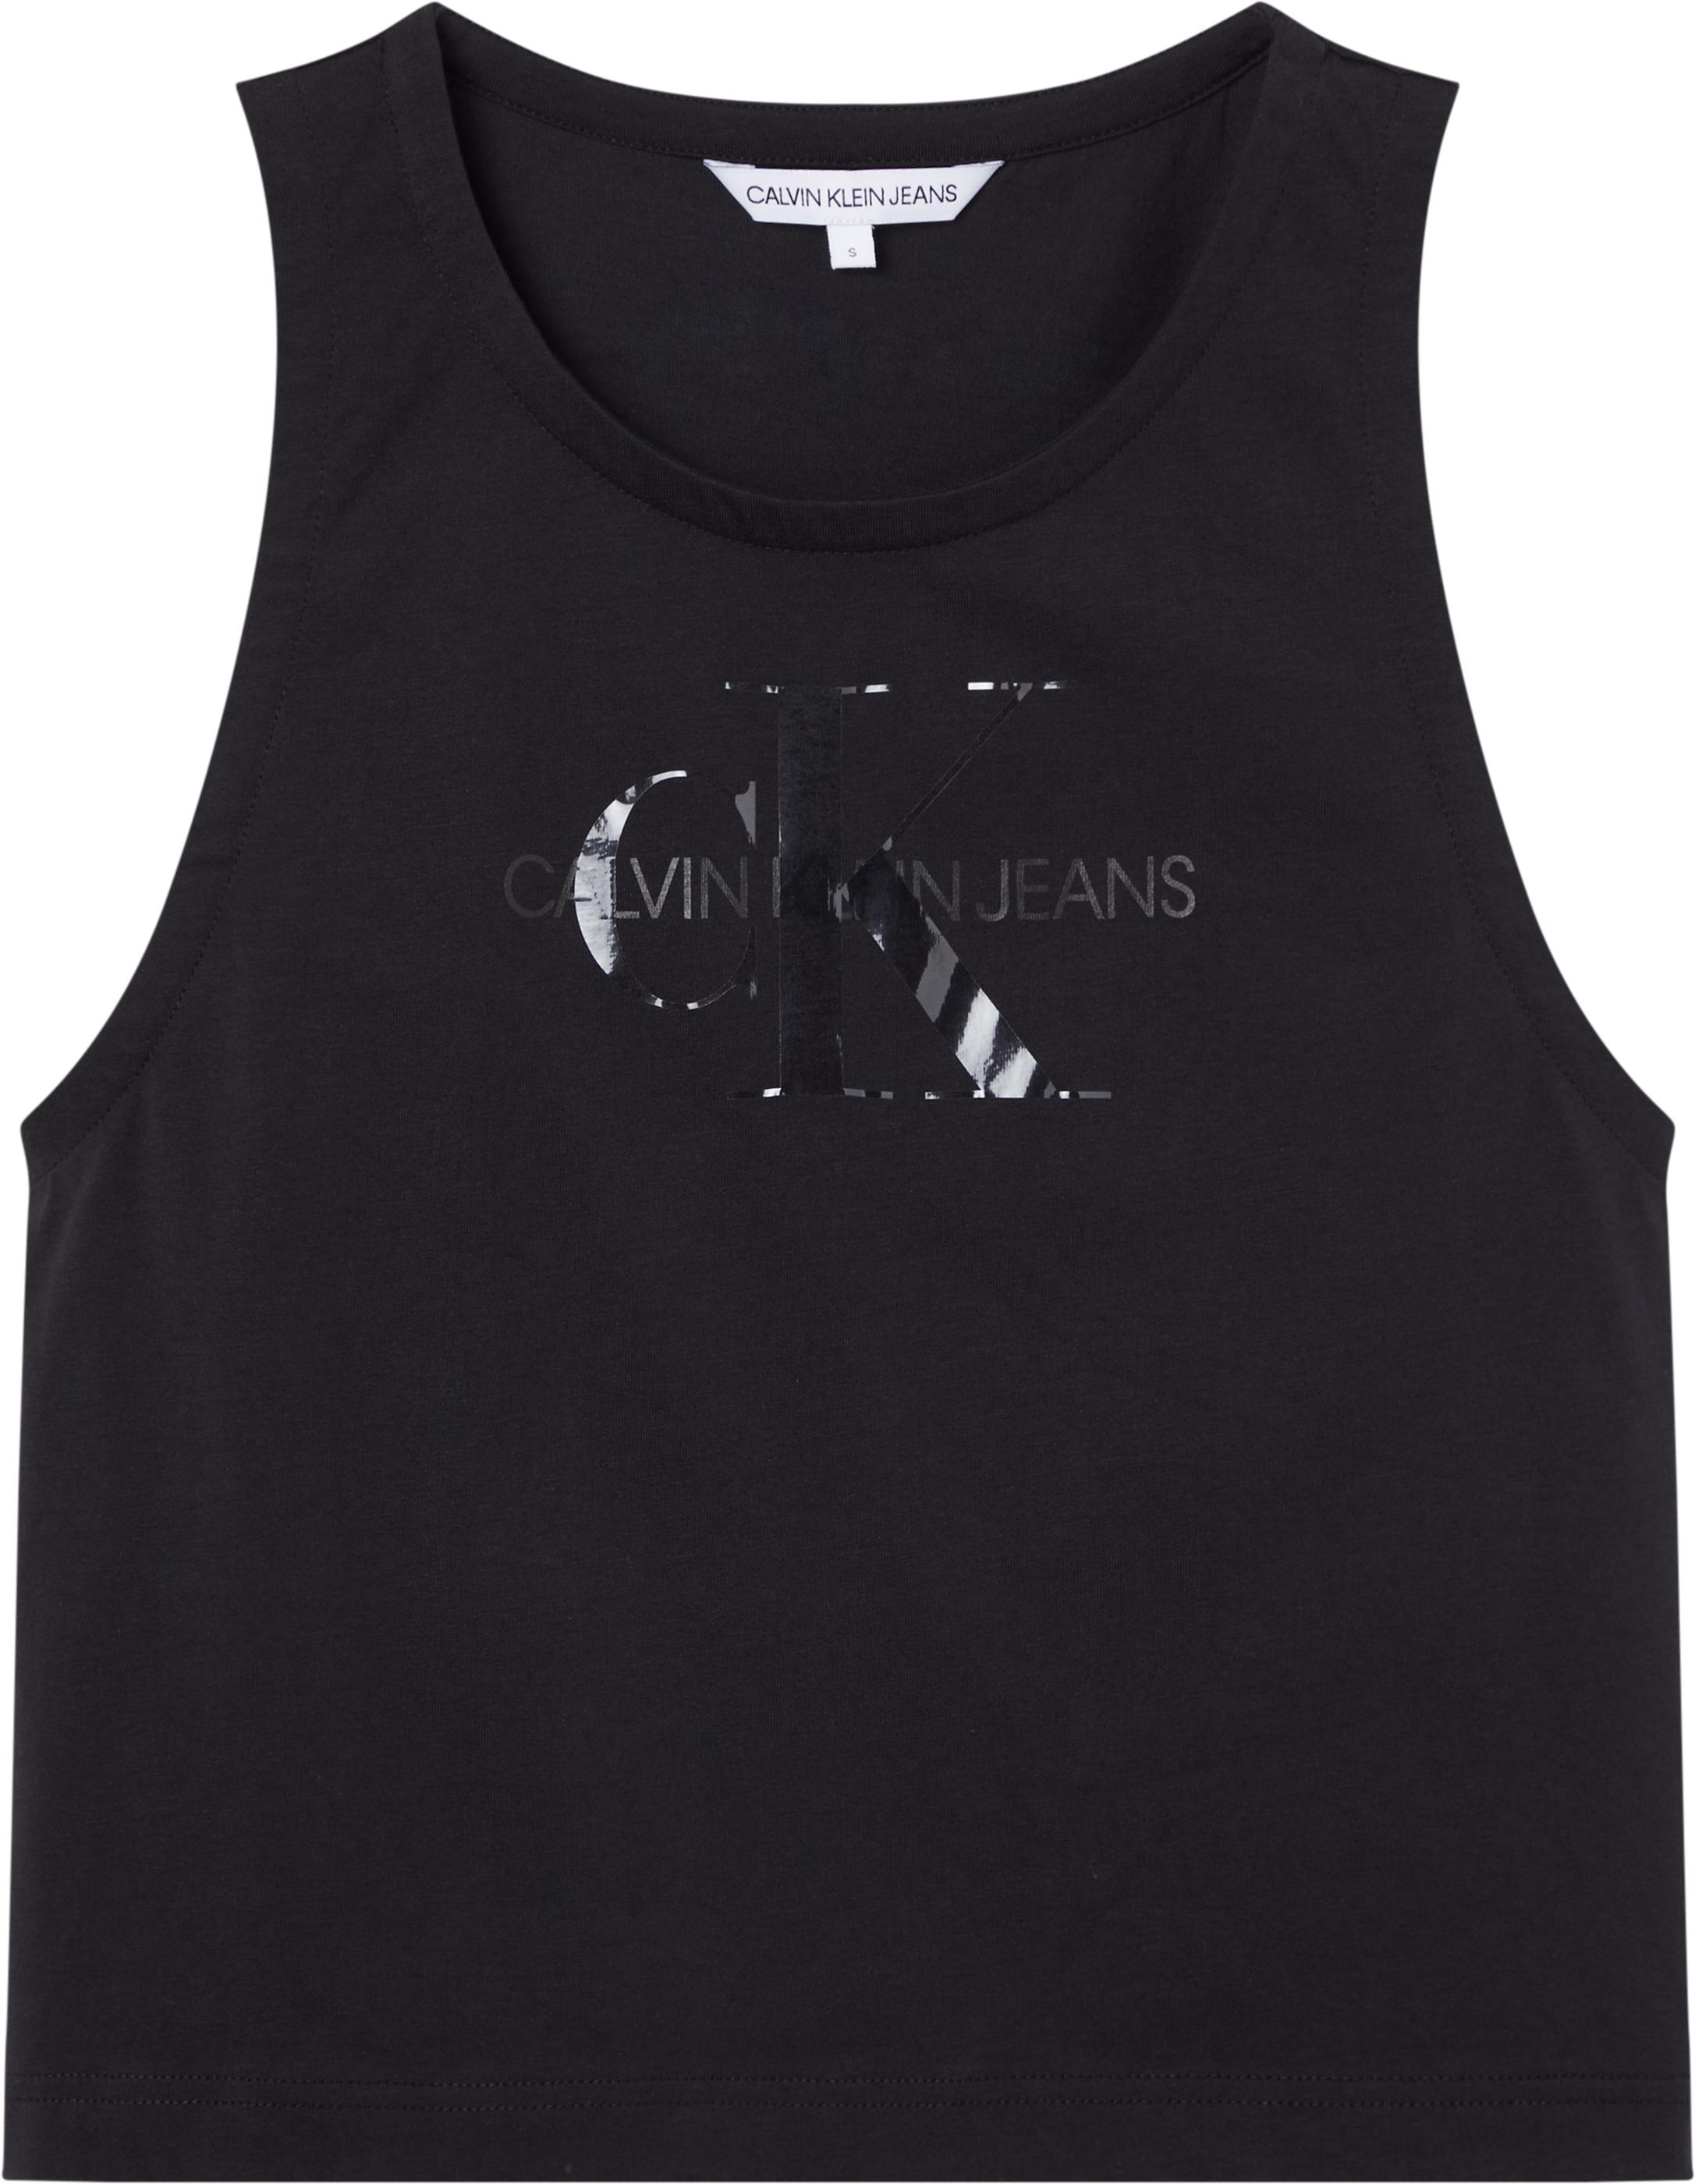 Calvin Klein Jeans TONAL MONOGRAM TANK TOP